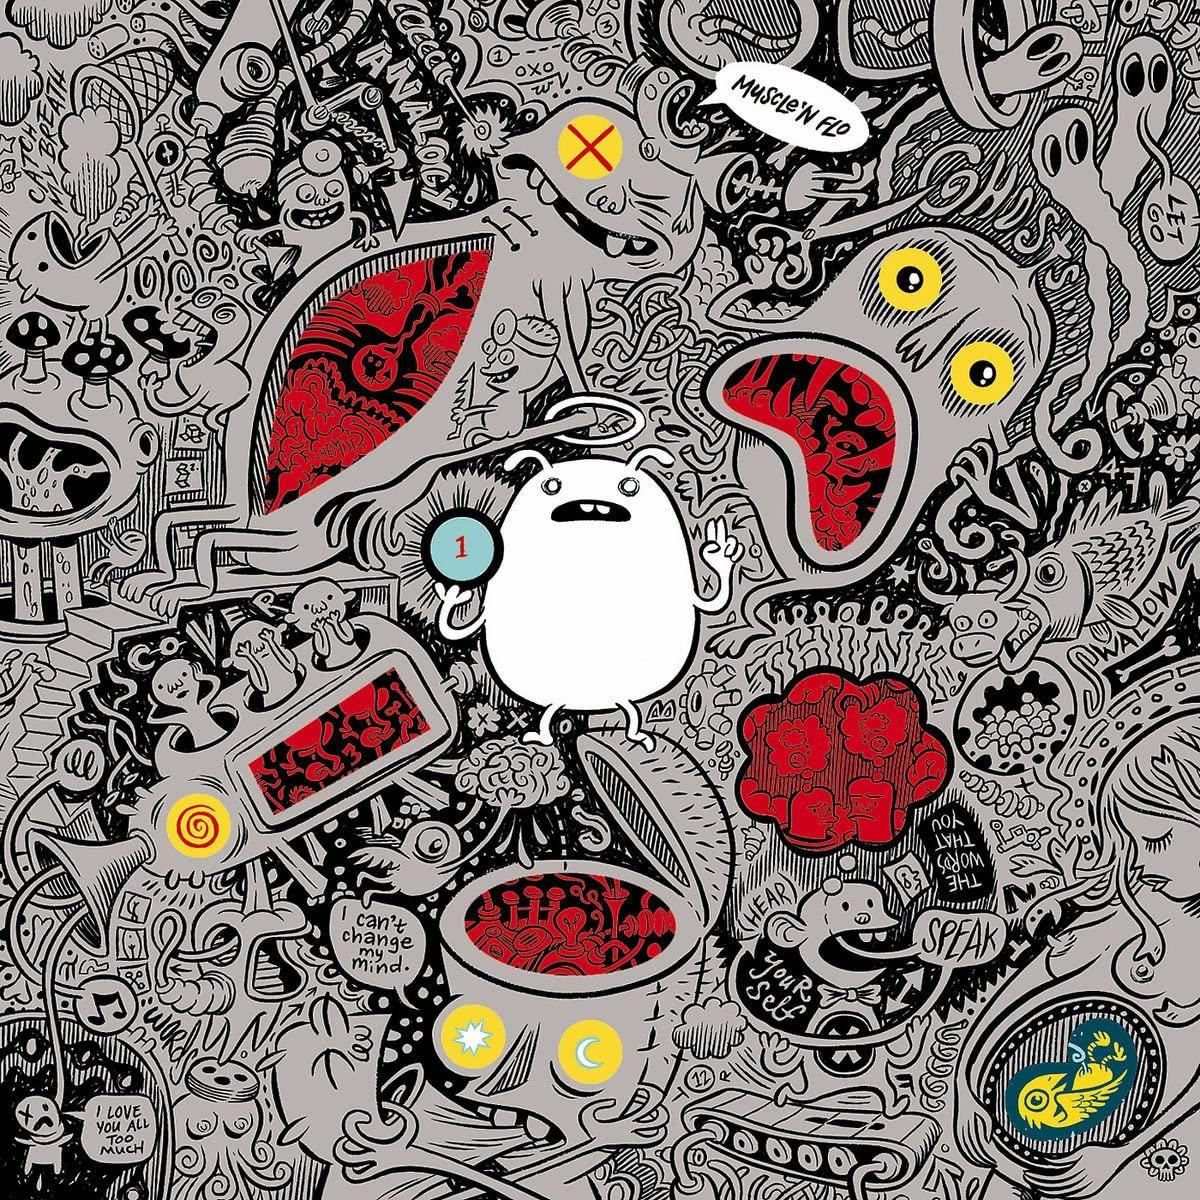 MENOMENA - FRIEND AND FOE MENOMENA (CD)